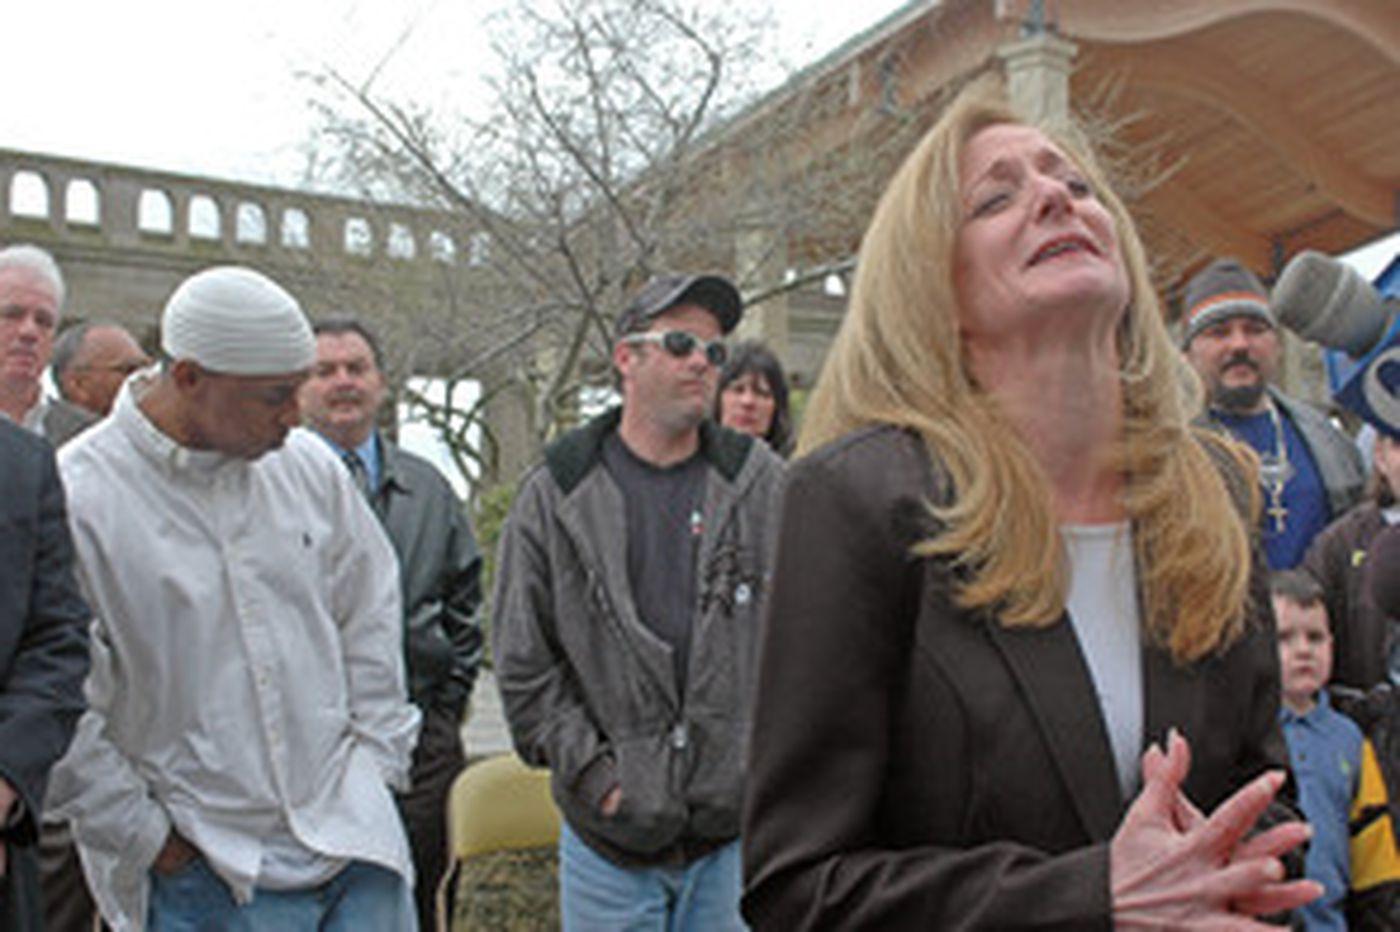 Collapse's survivors say award no comfort